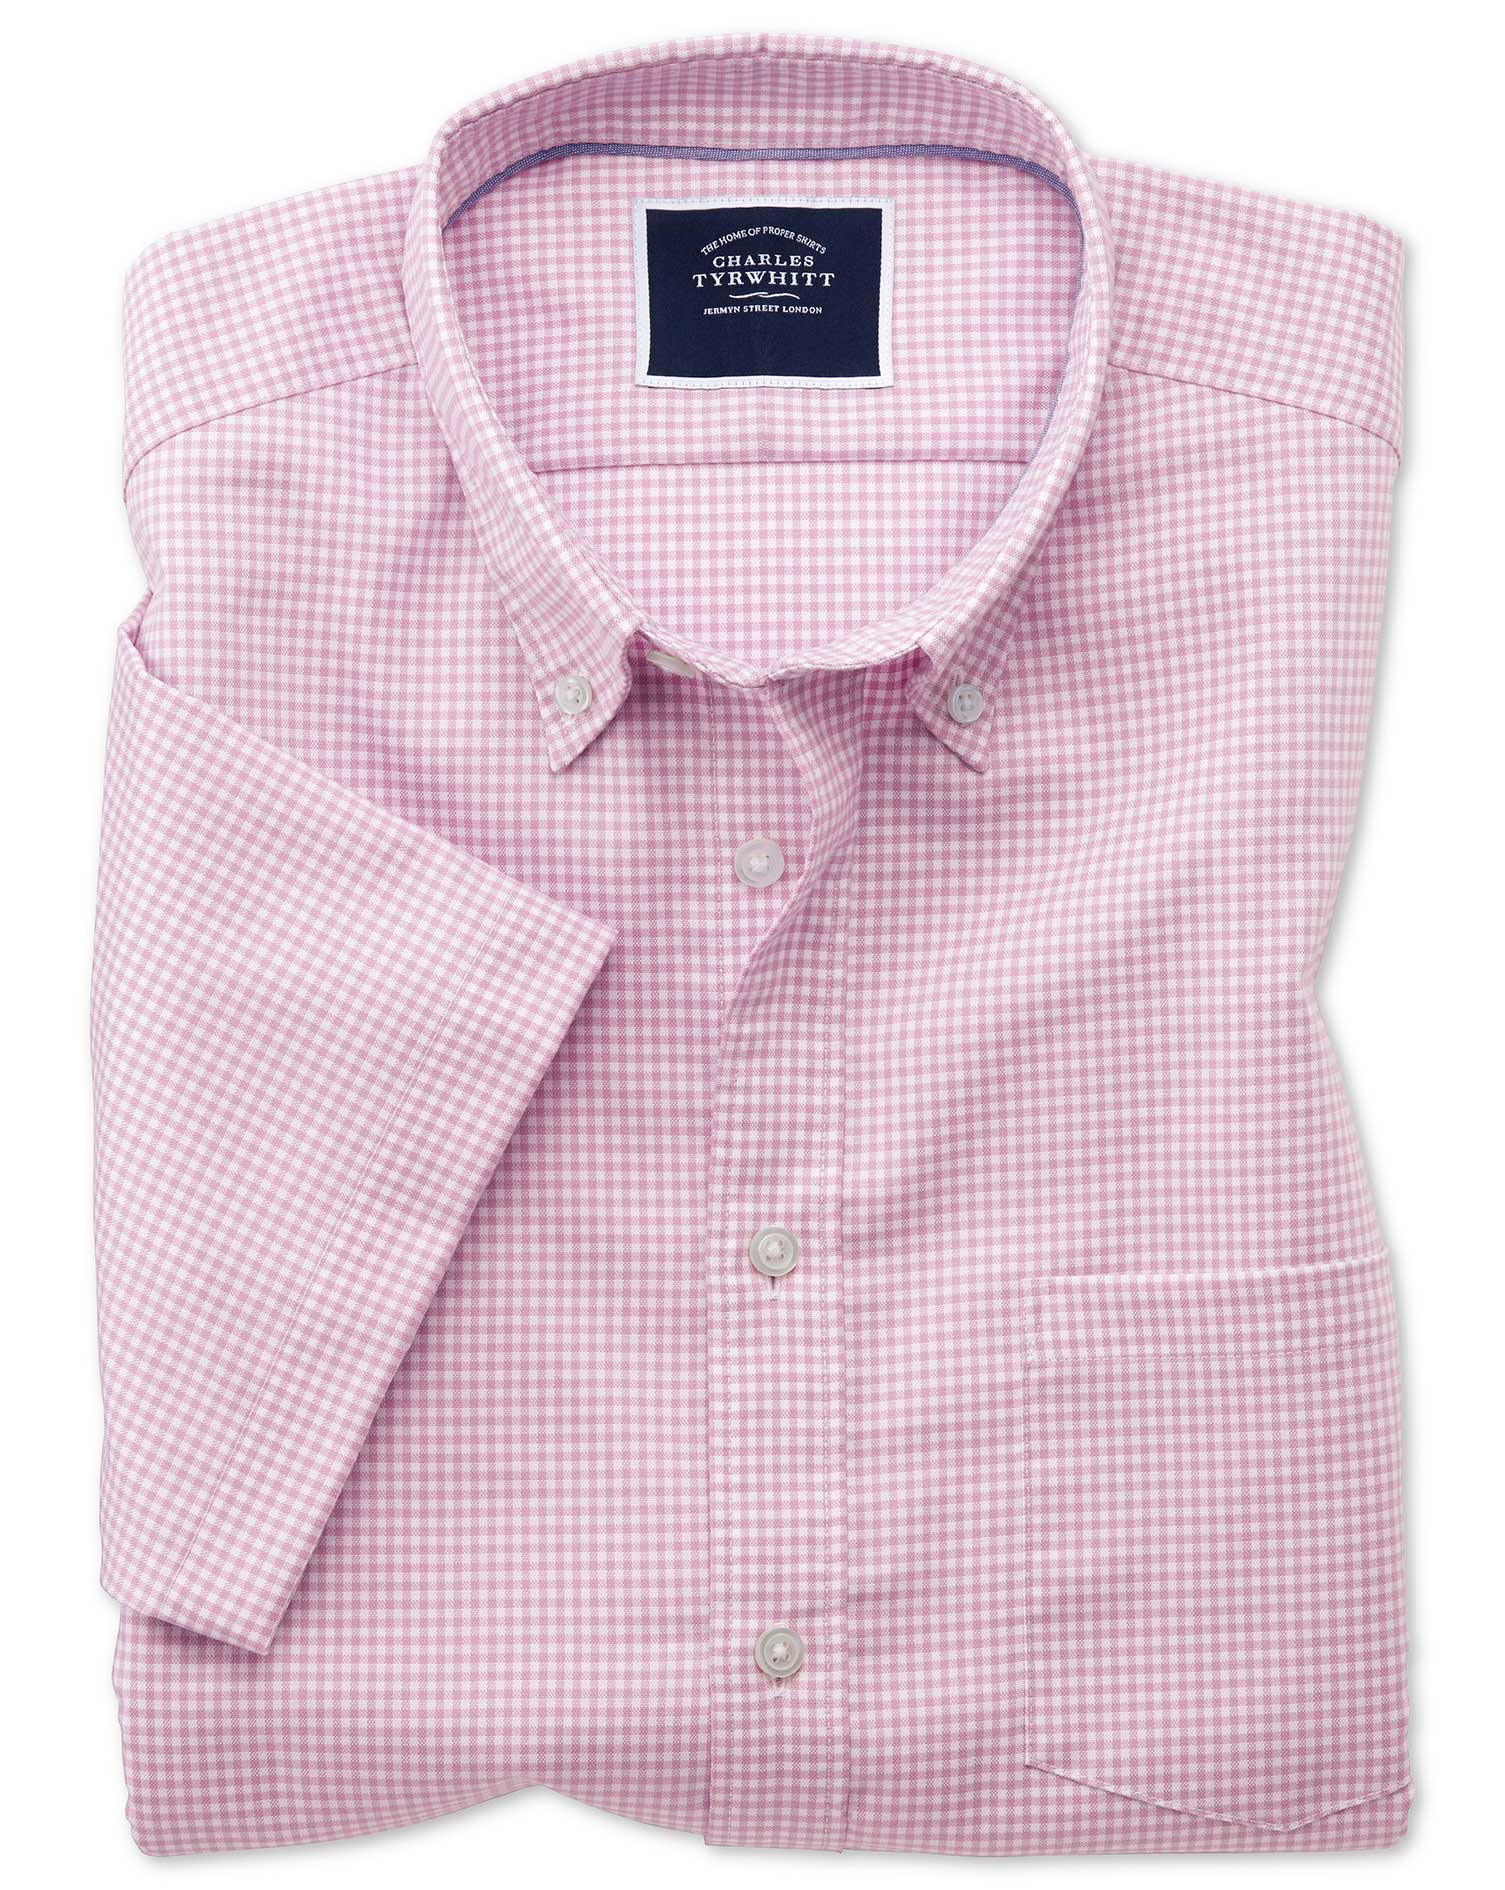 Slim Fit Pink Short Sleeve Gingham Soft Washed Non-Iron Stretch Cotton Shirt Single Cuff Size Medium